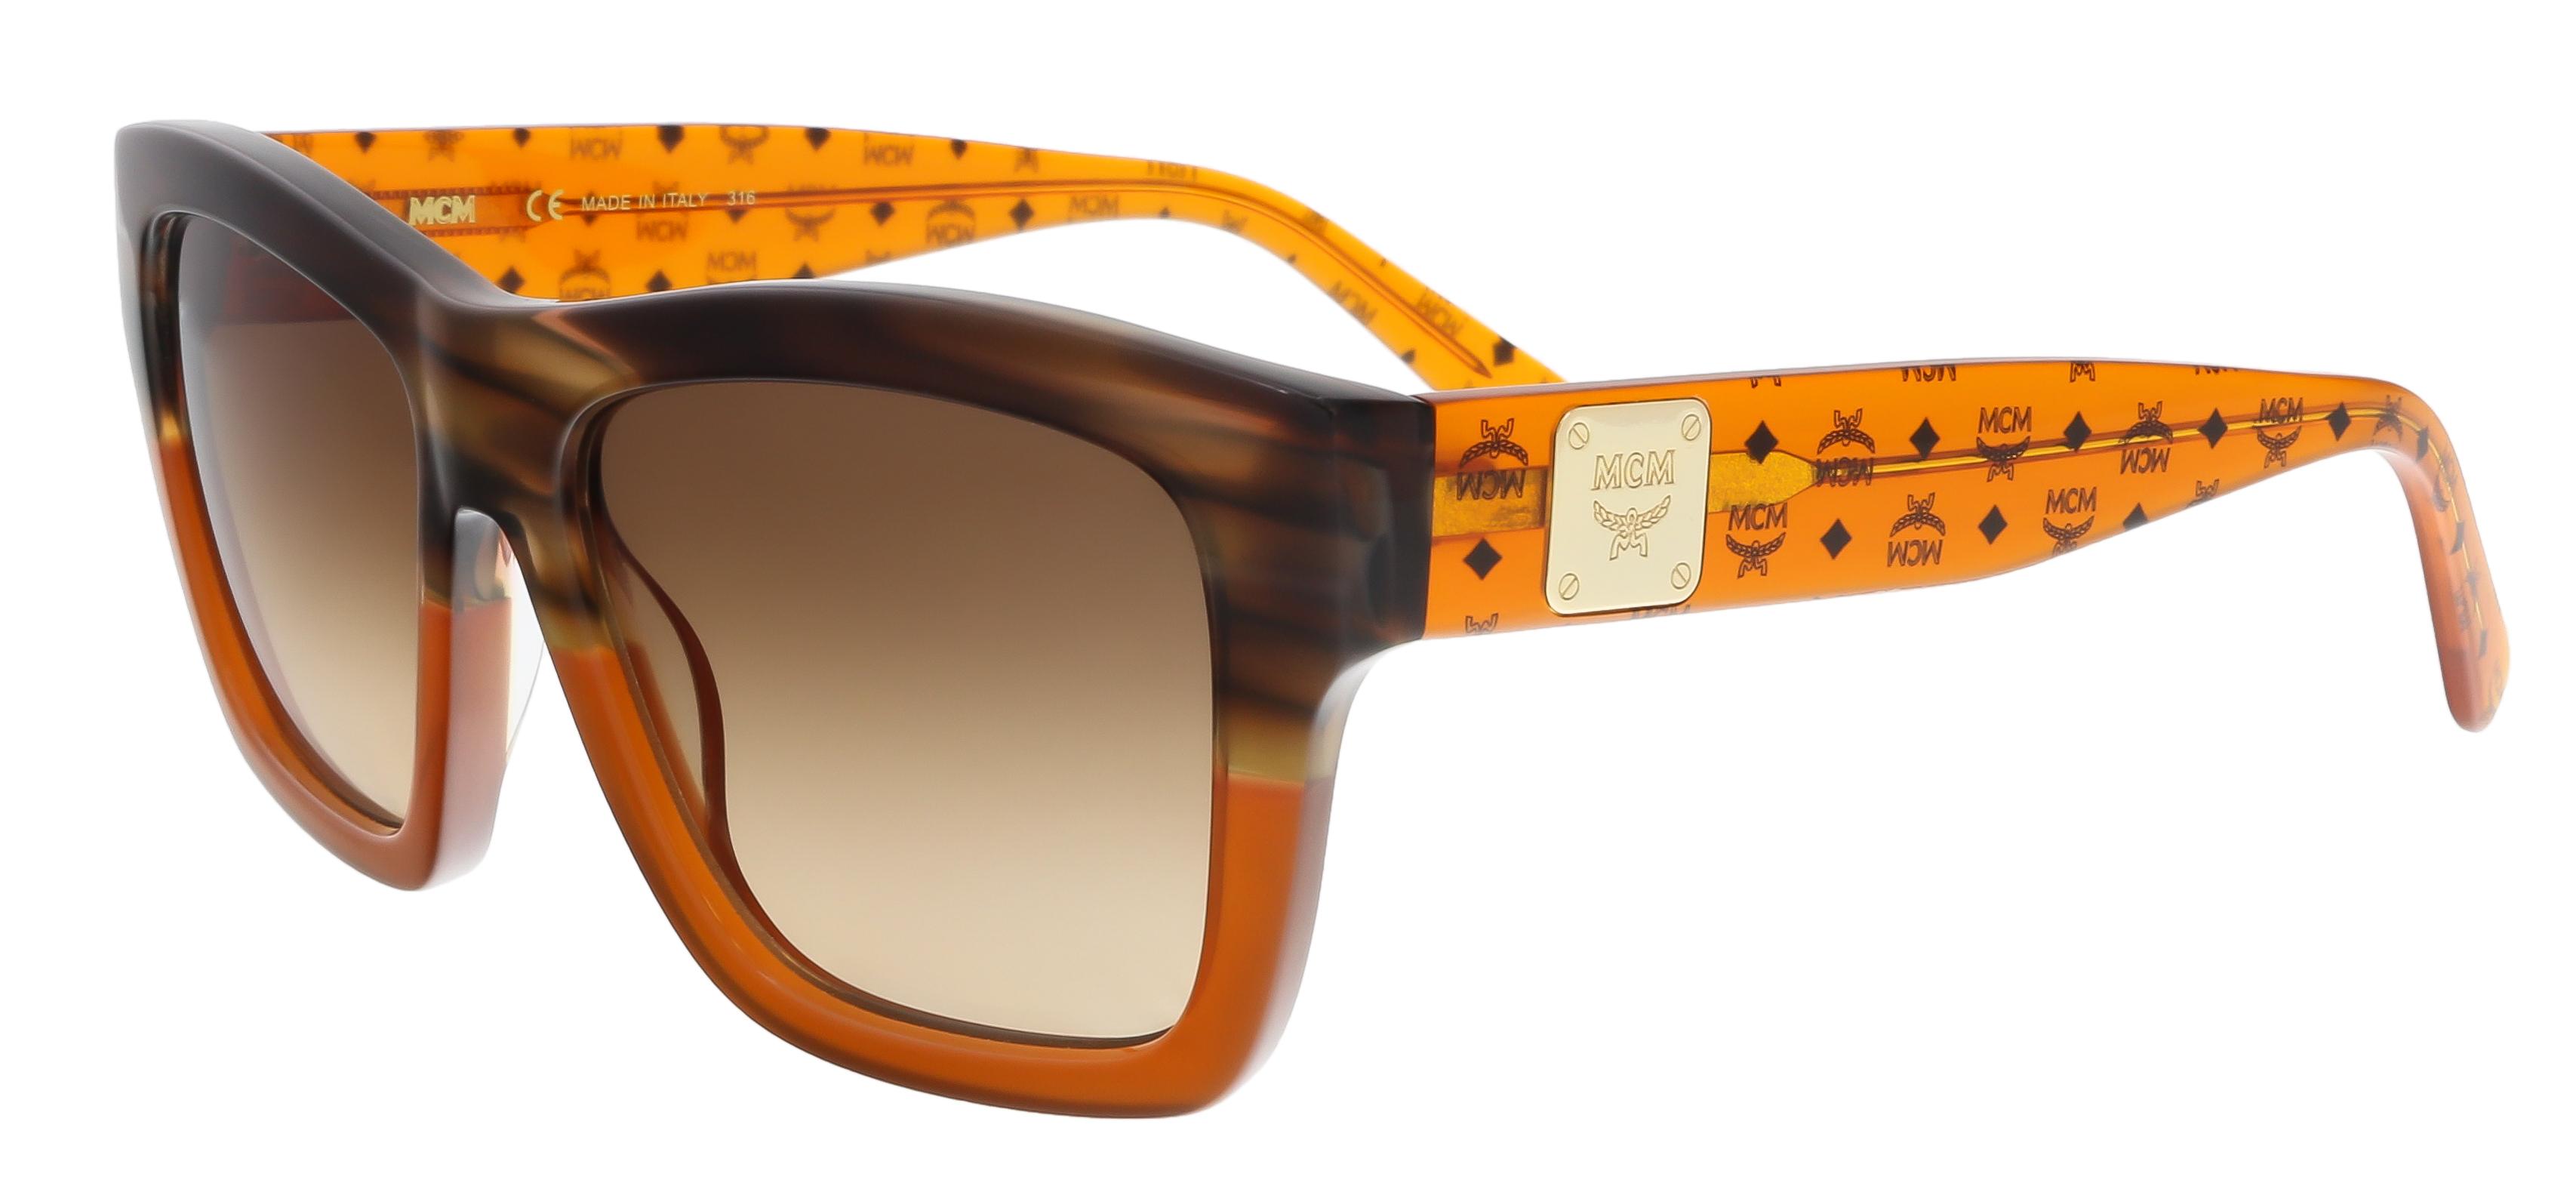 MCM607S 284 Striped Brown-Cognac Square Feline Sunglasses